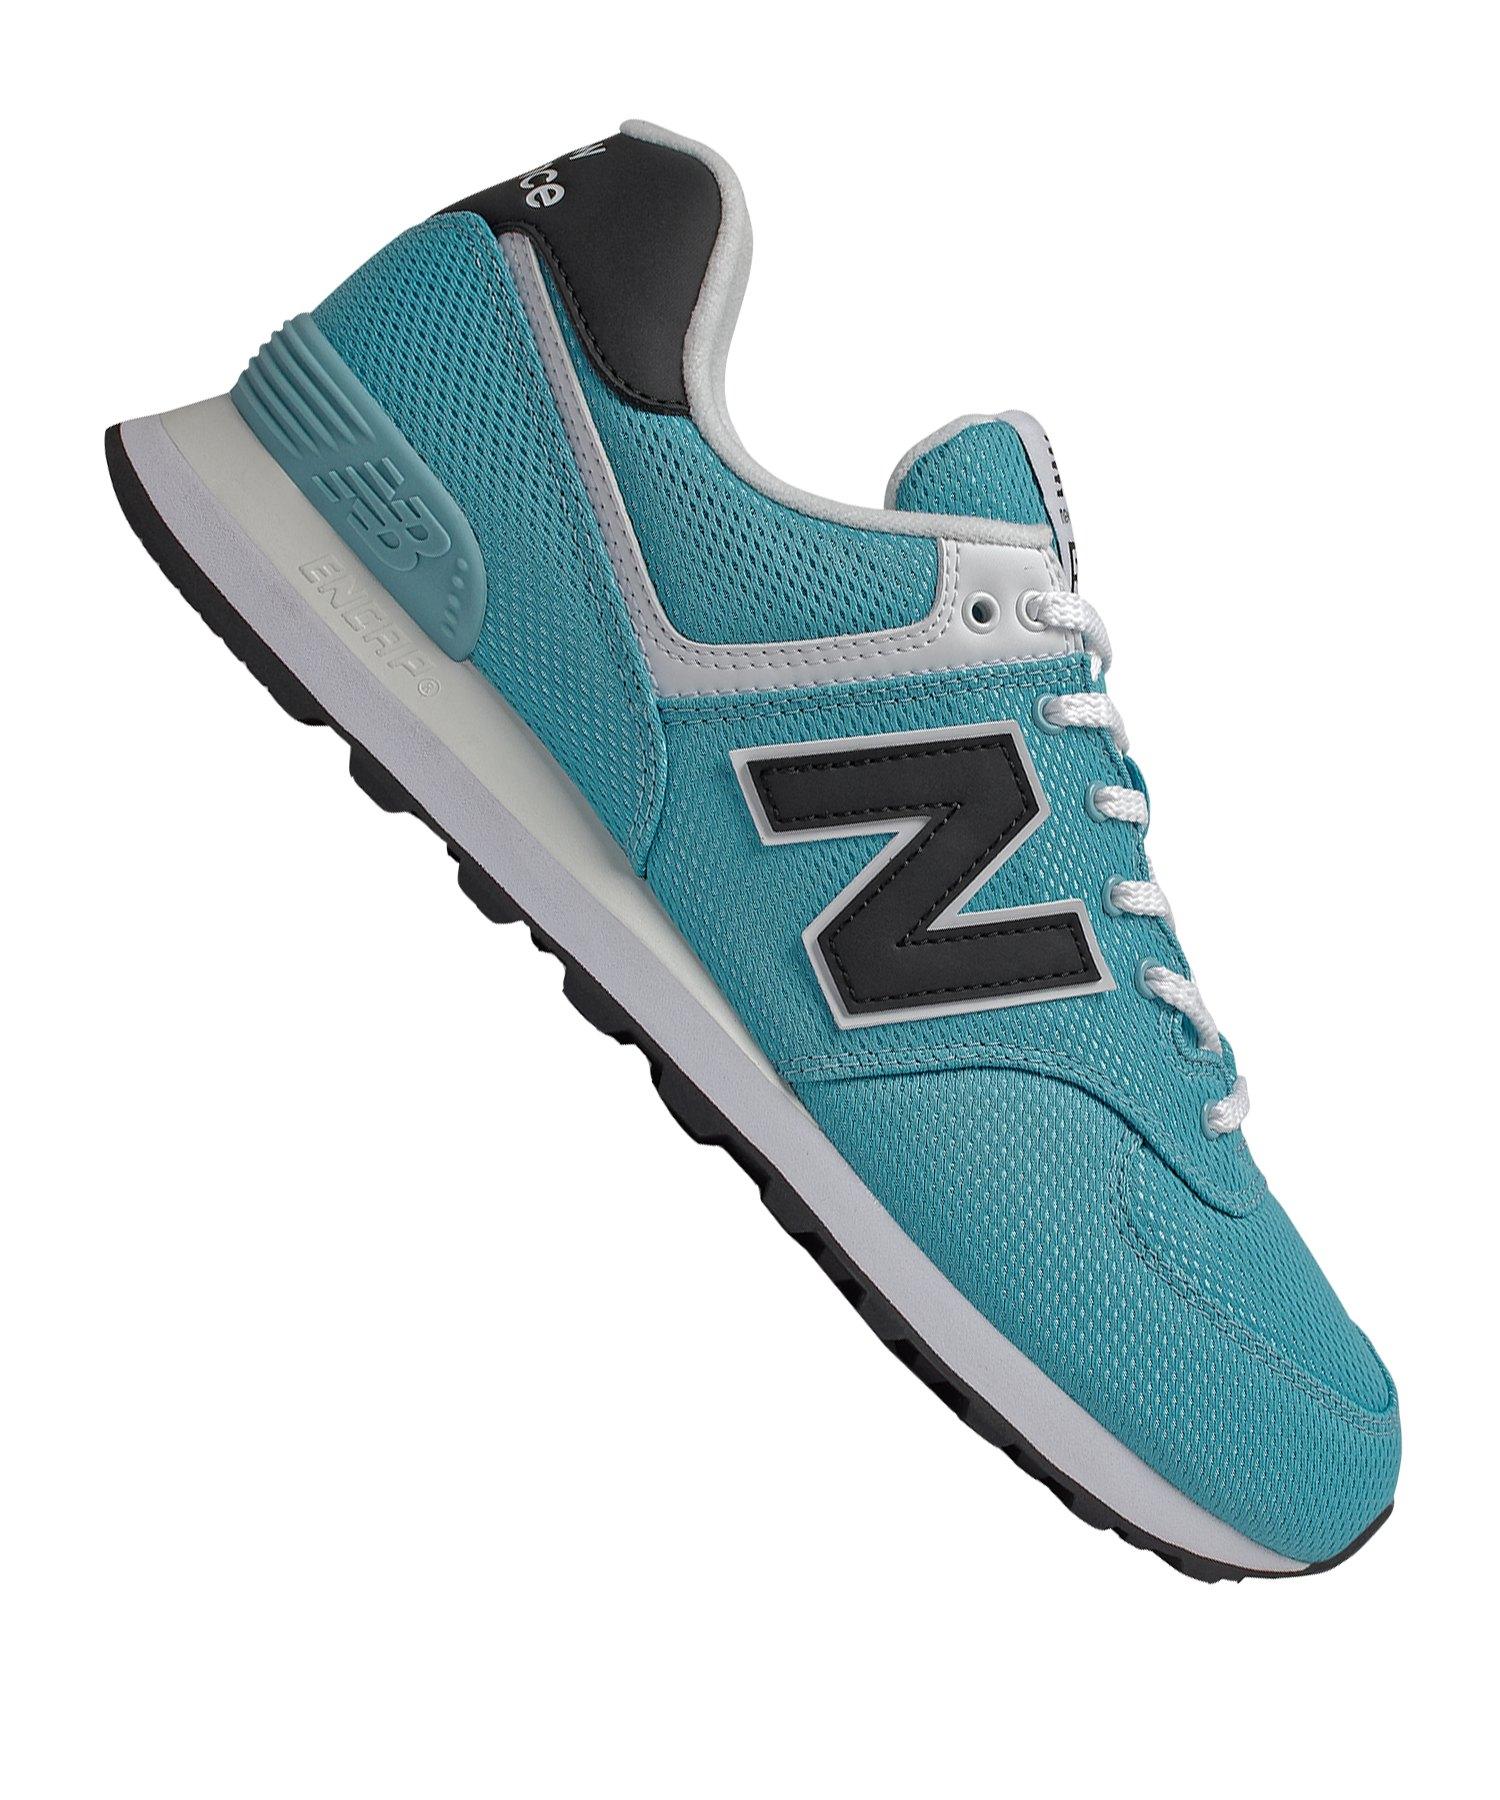 quality design dcc35 00de1 New Balance ML574 D Sneaker Blau F05